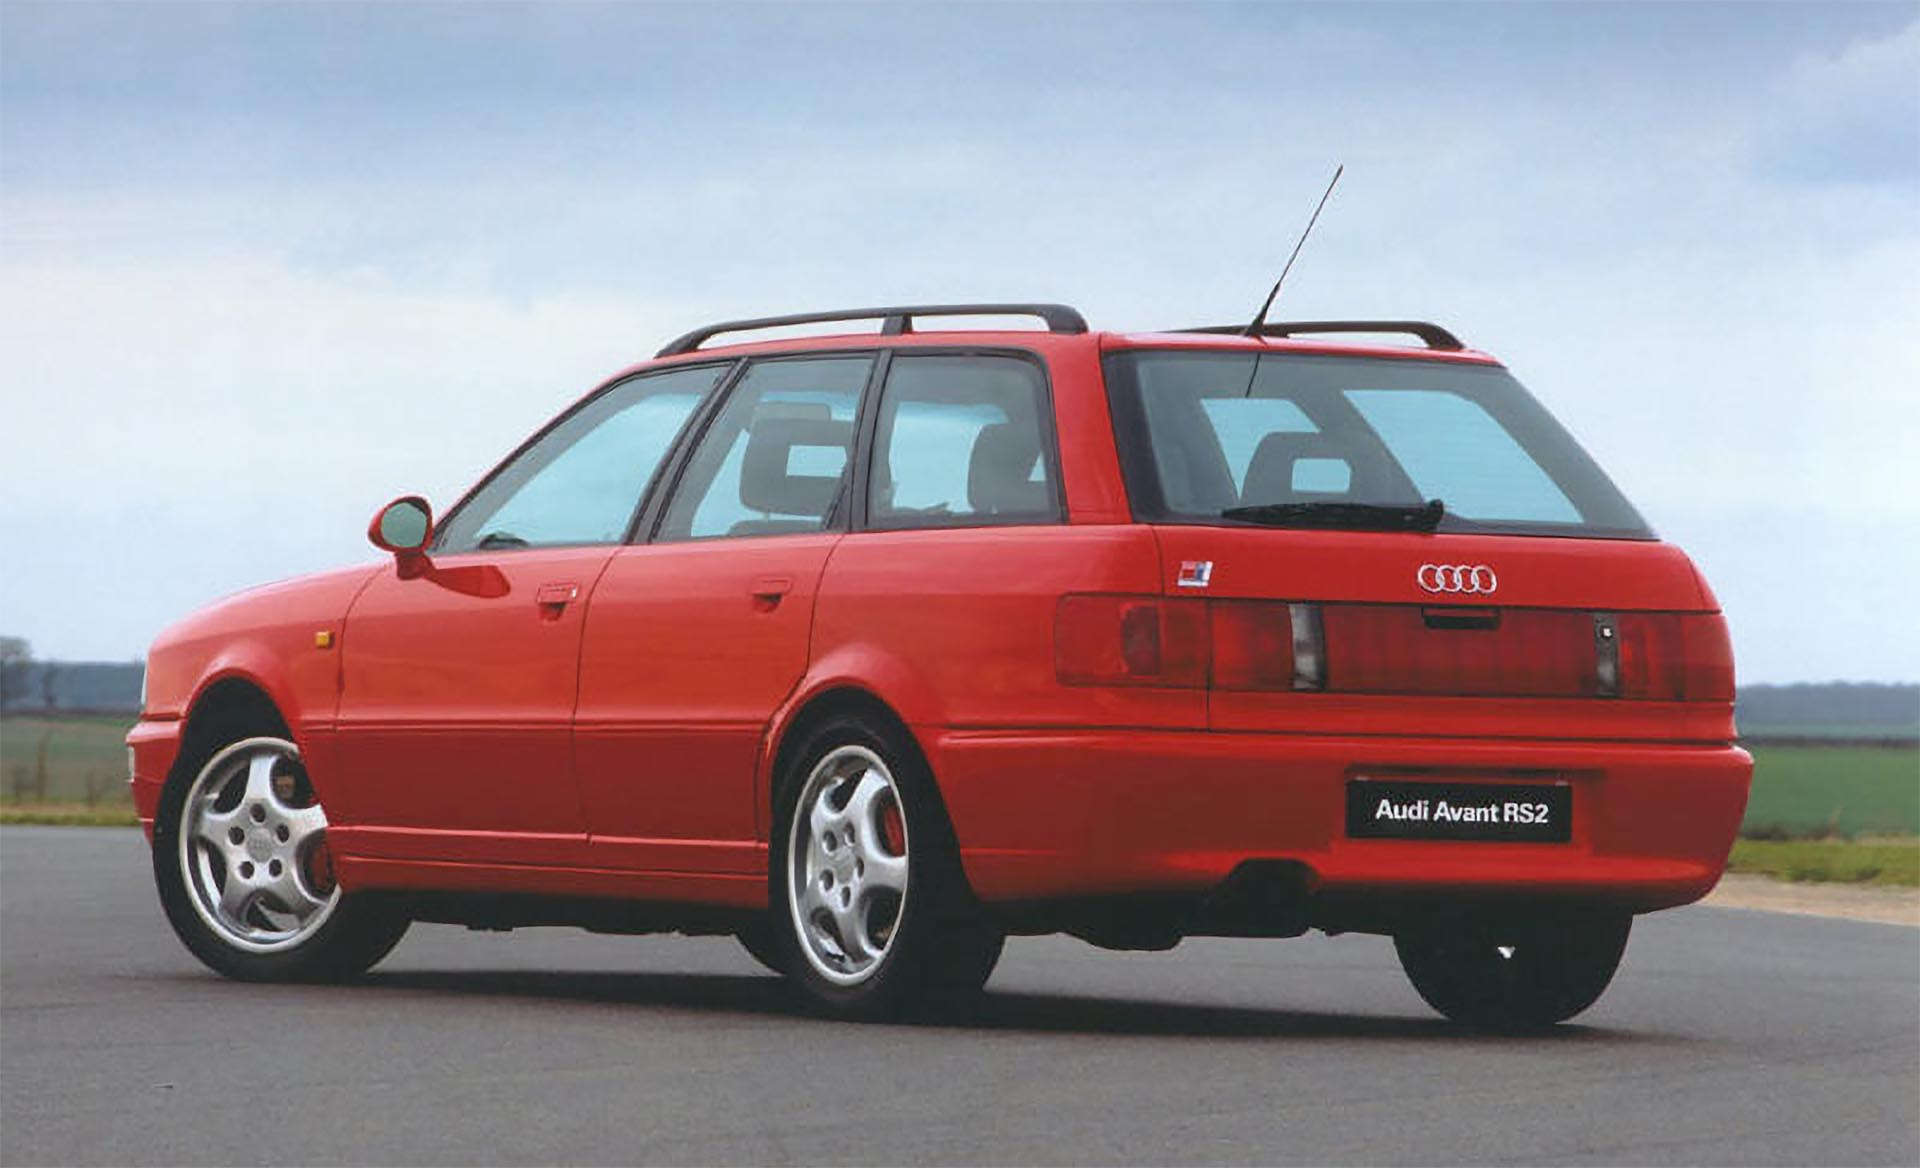 9-12_Audi RS2 Avant Rear